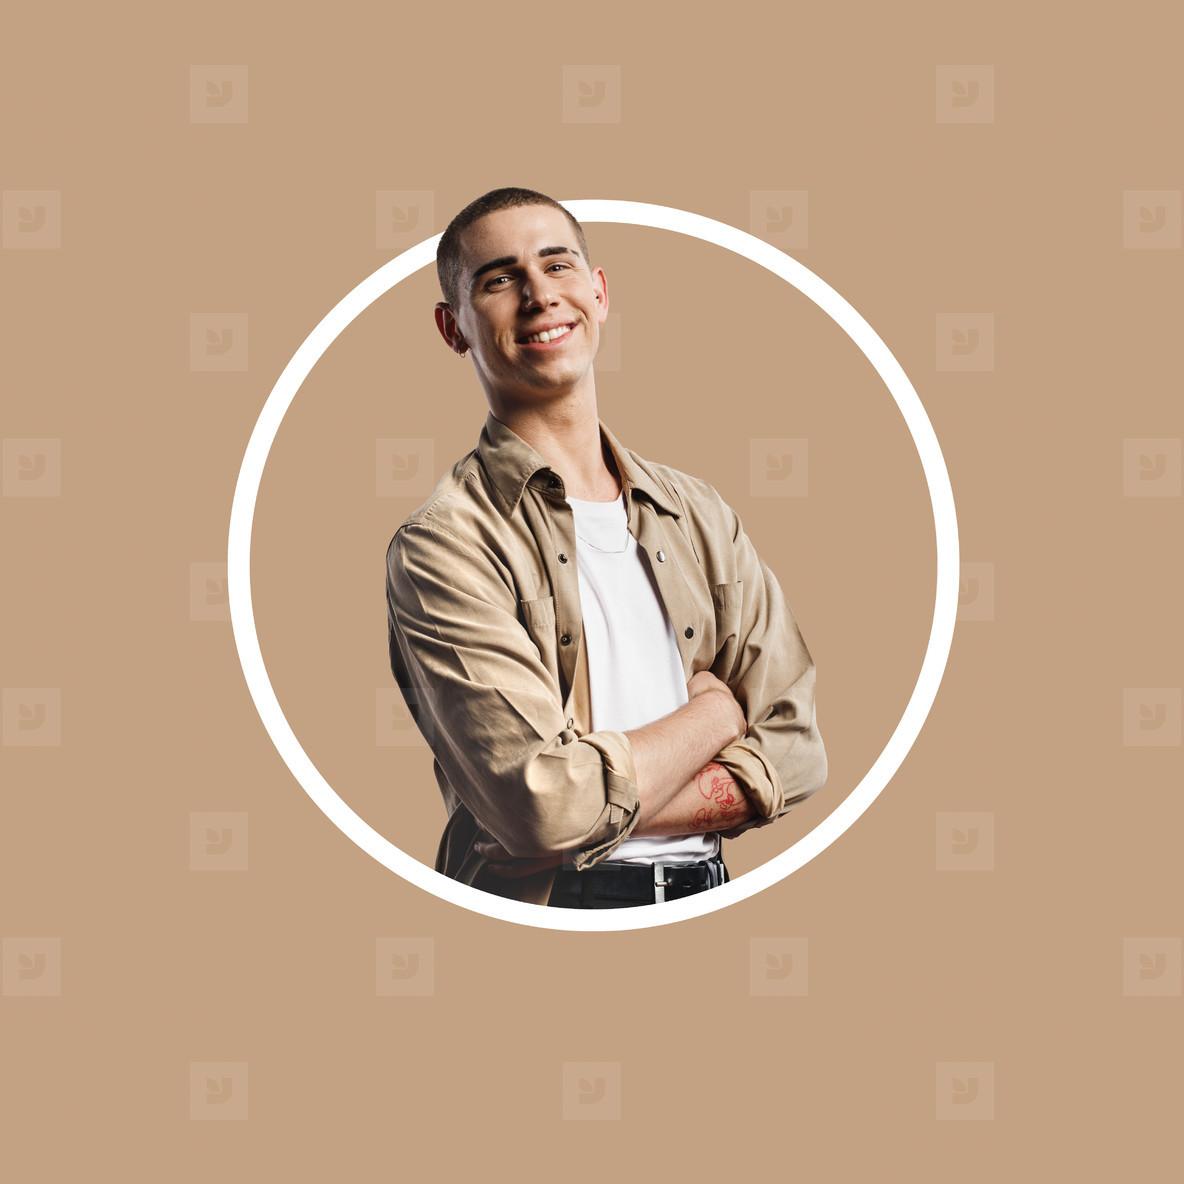 Circle crop shot of caucasian man